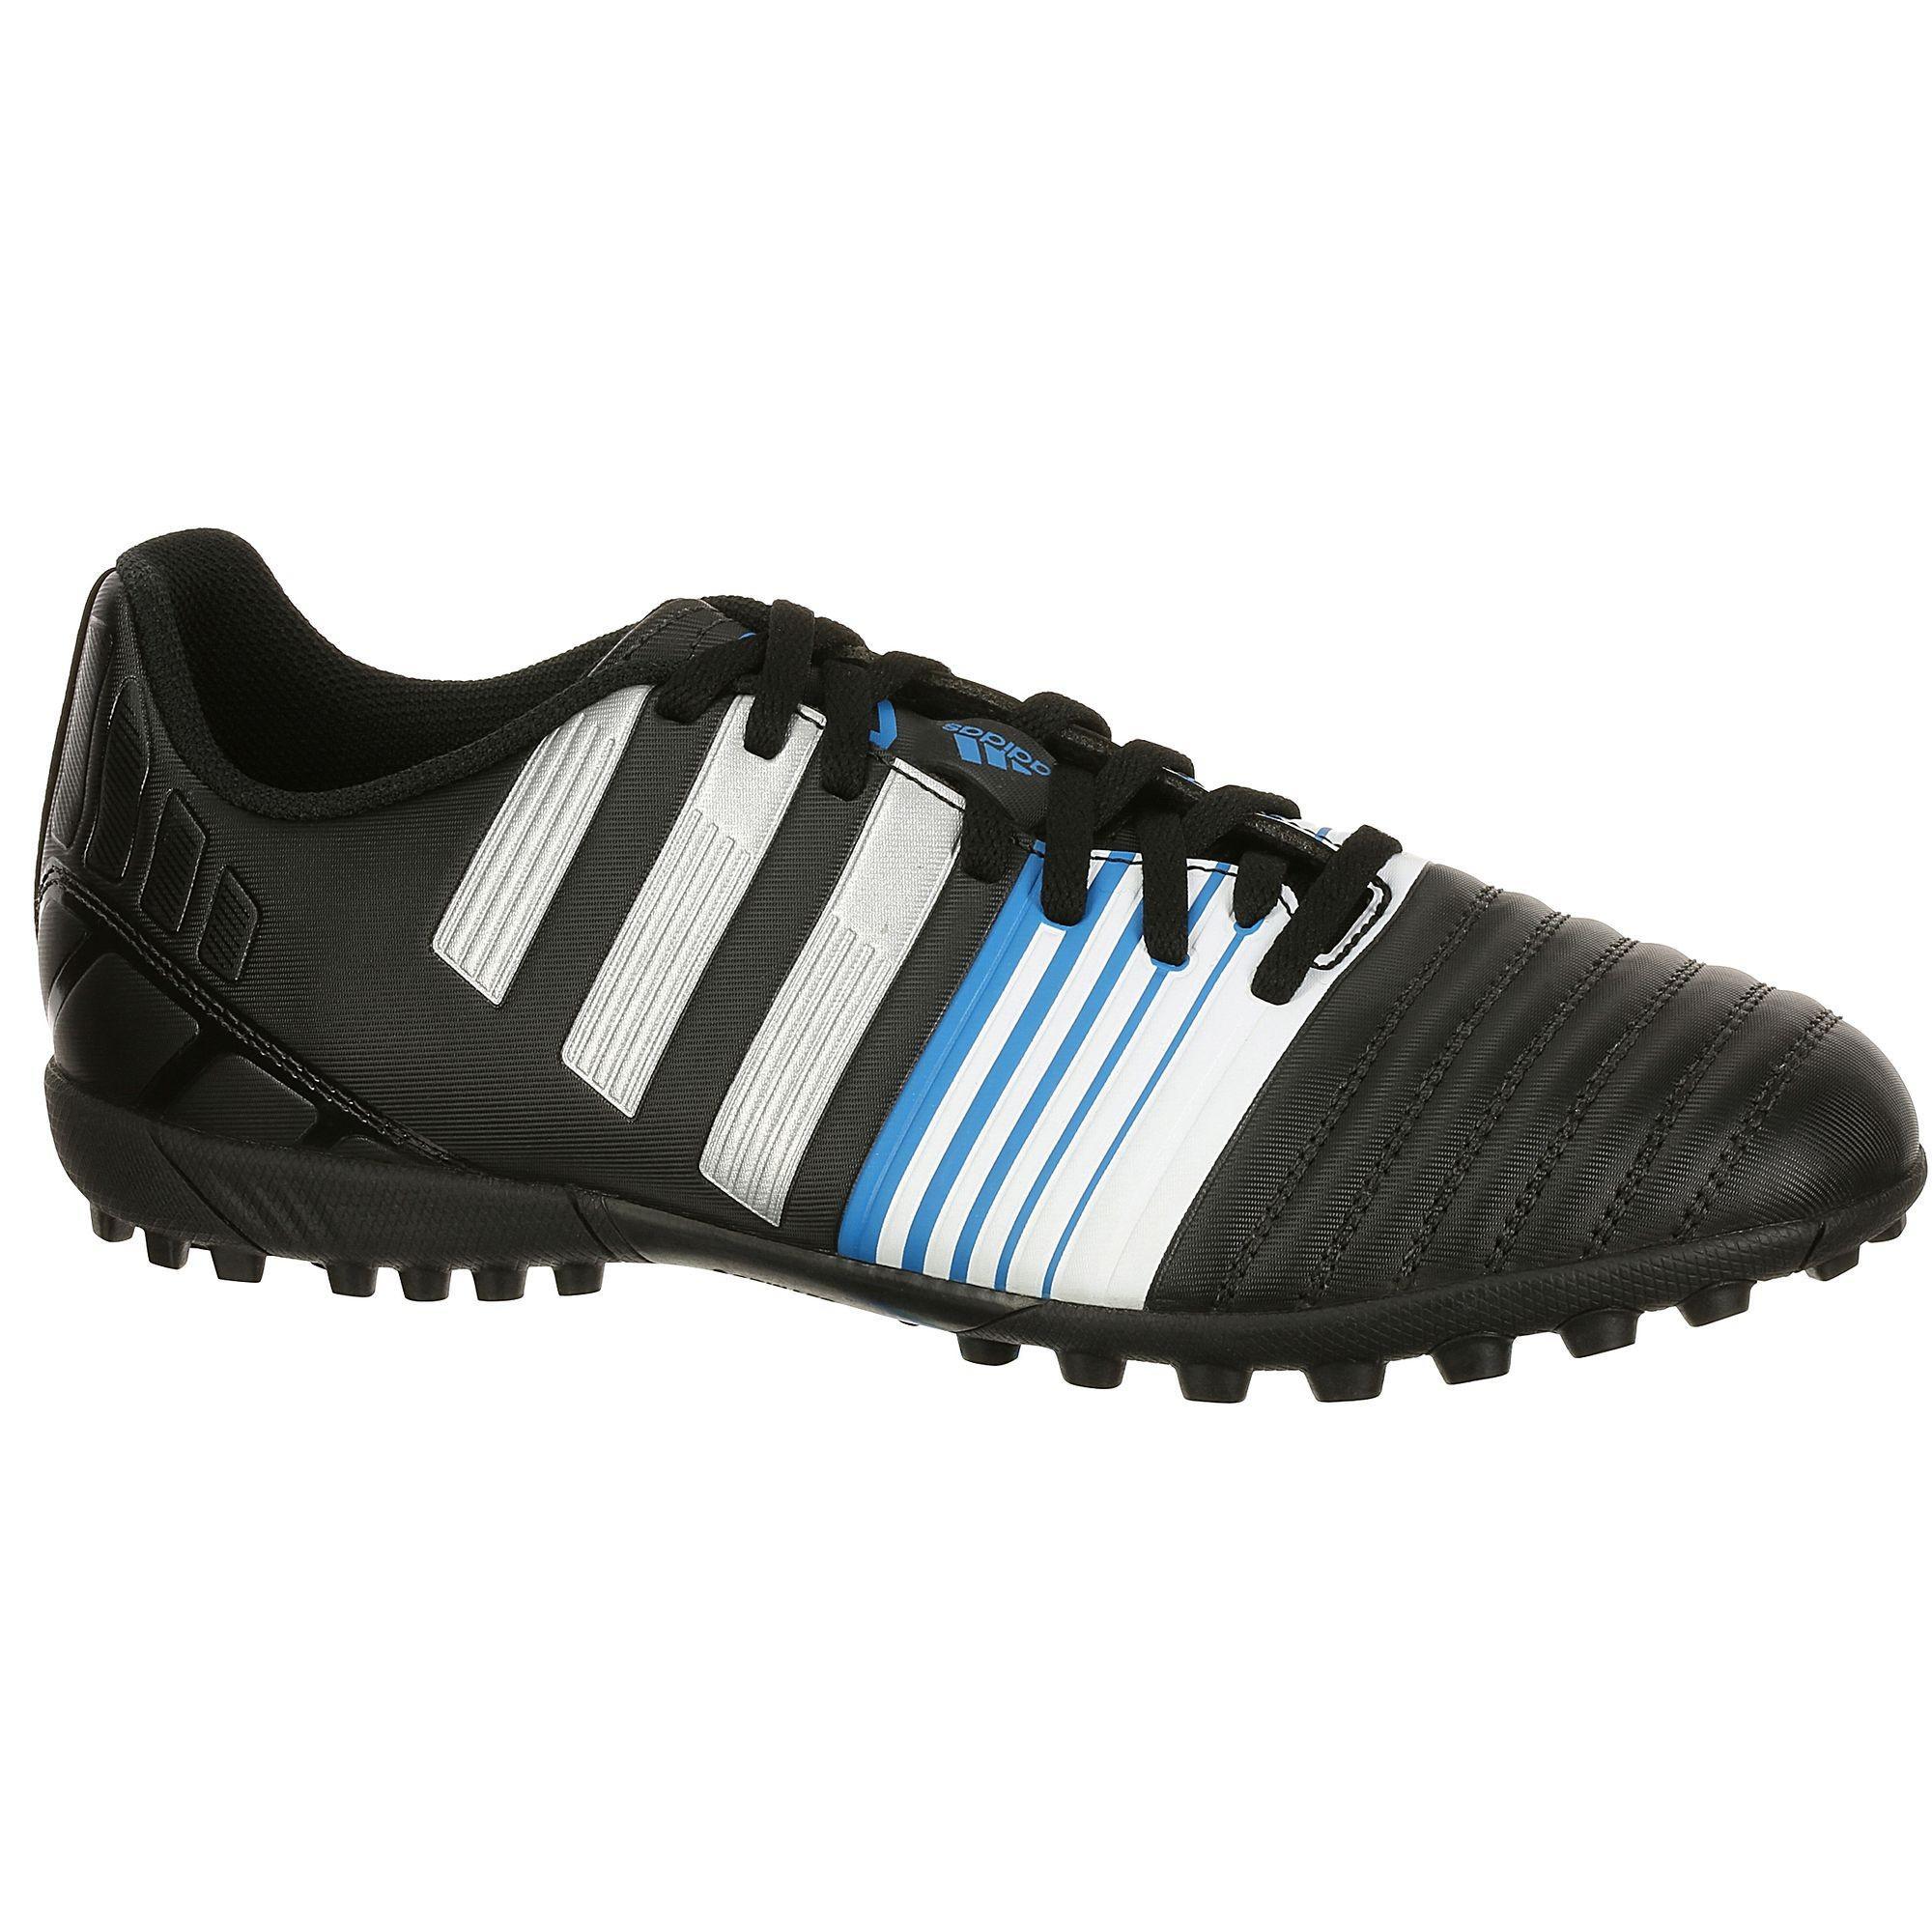 Chaussure de football Adidas Nitrocharge 4.0 TF - Noir